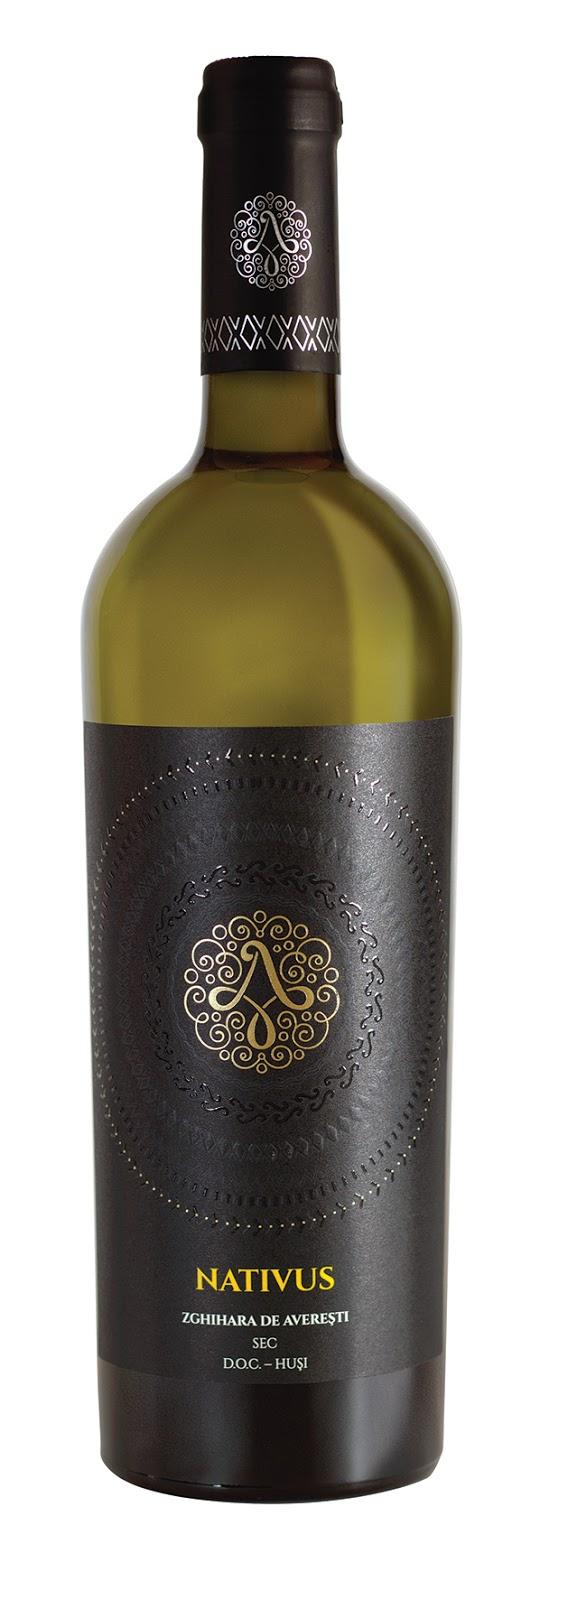 Vin alb - Nativus Aligote de Averesti, sec 2015 Crama Averesti